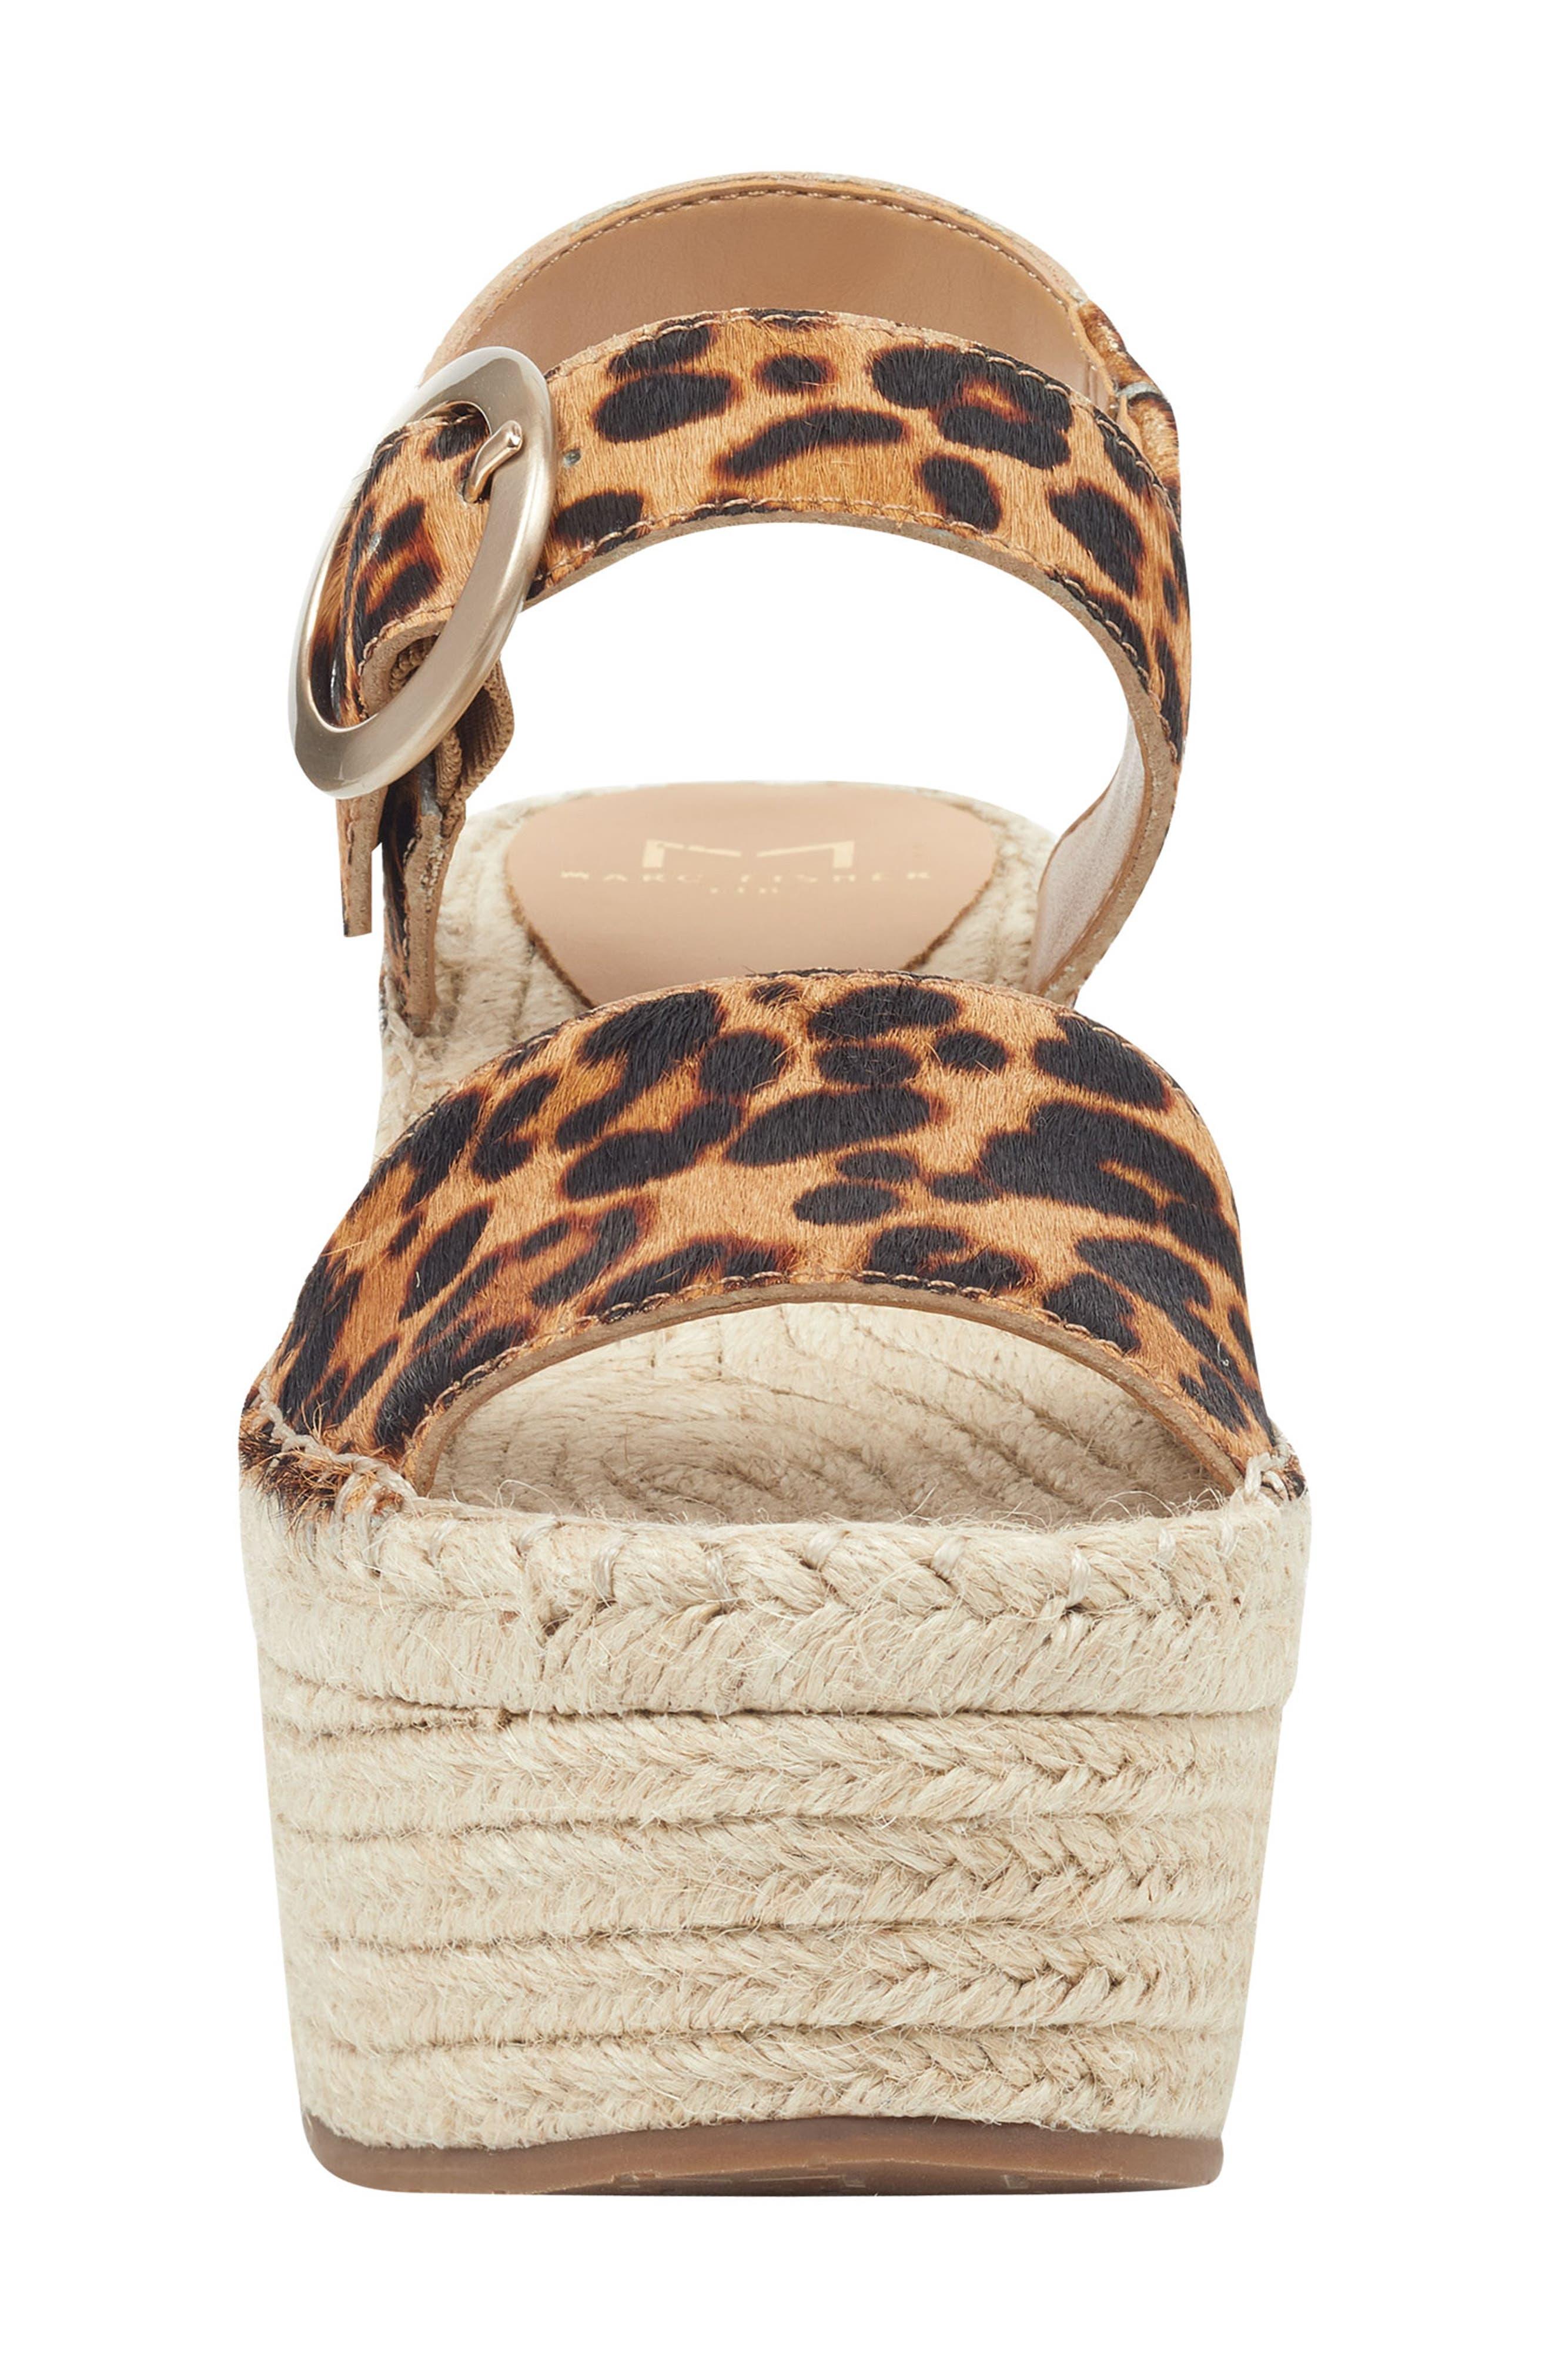 MARC FISHER LTD,                             Rexly Espadrille Platform Sandal,                             Alternate thumbnail 4, color,                             LEOPARD HAIR CALF